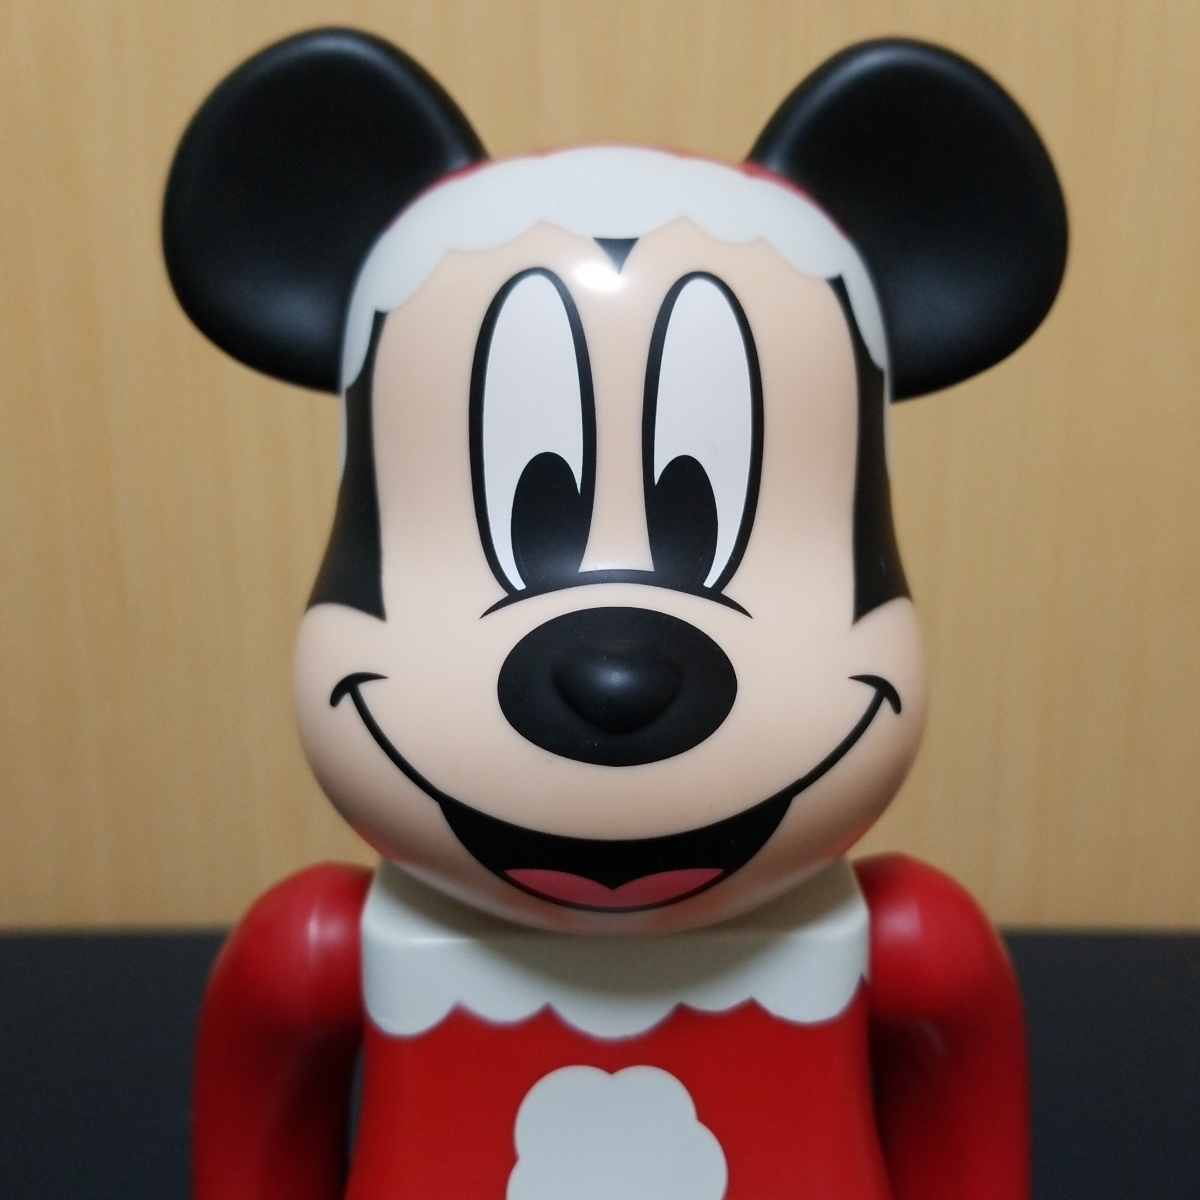 MEDICOM TOY メディコムトイ BE@RBRICK ベアブリック ミッキーマウス サンタver 特賞 400% サンタクロース_画像2